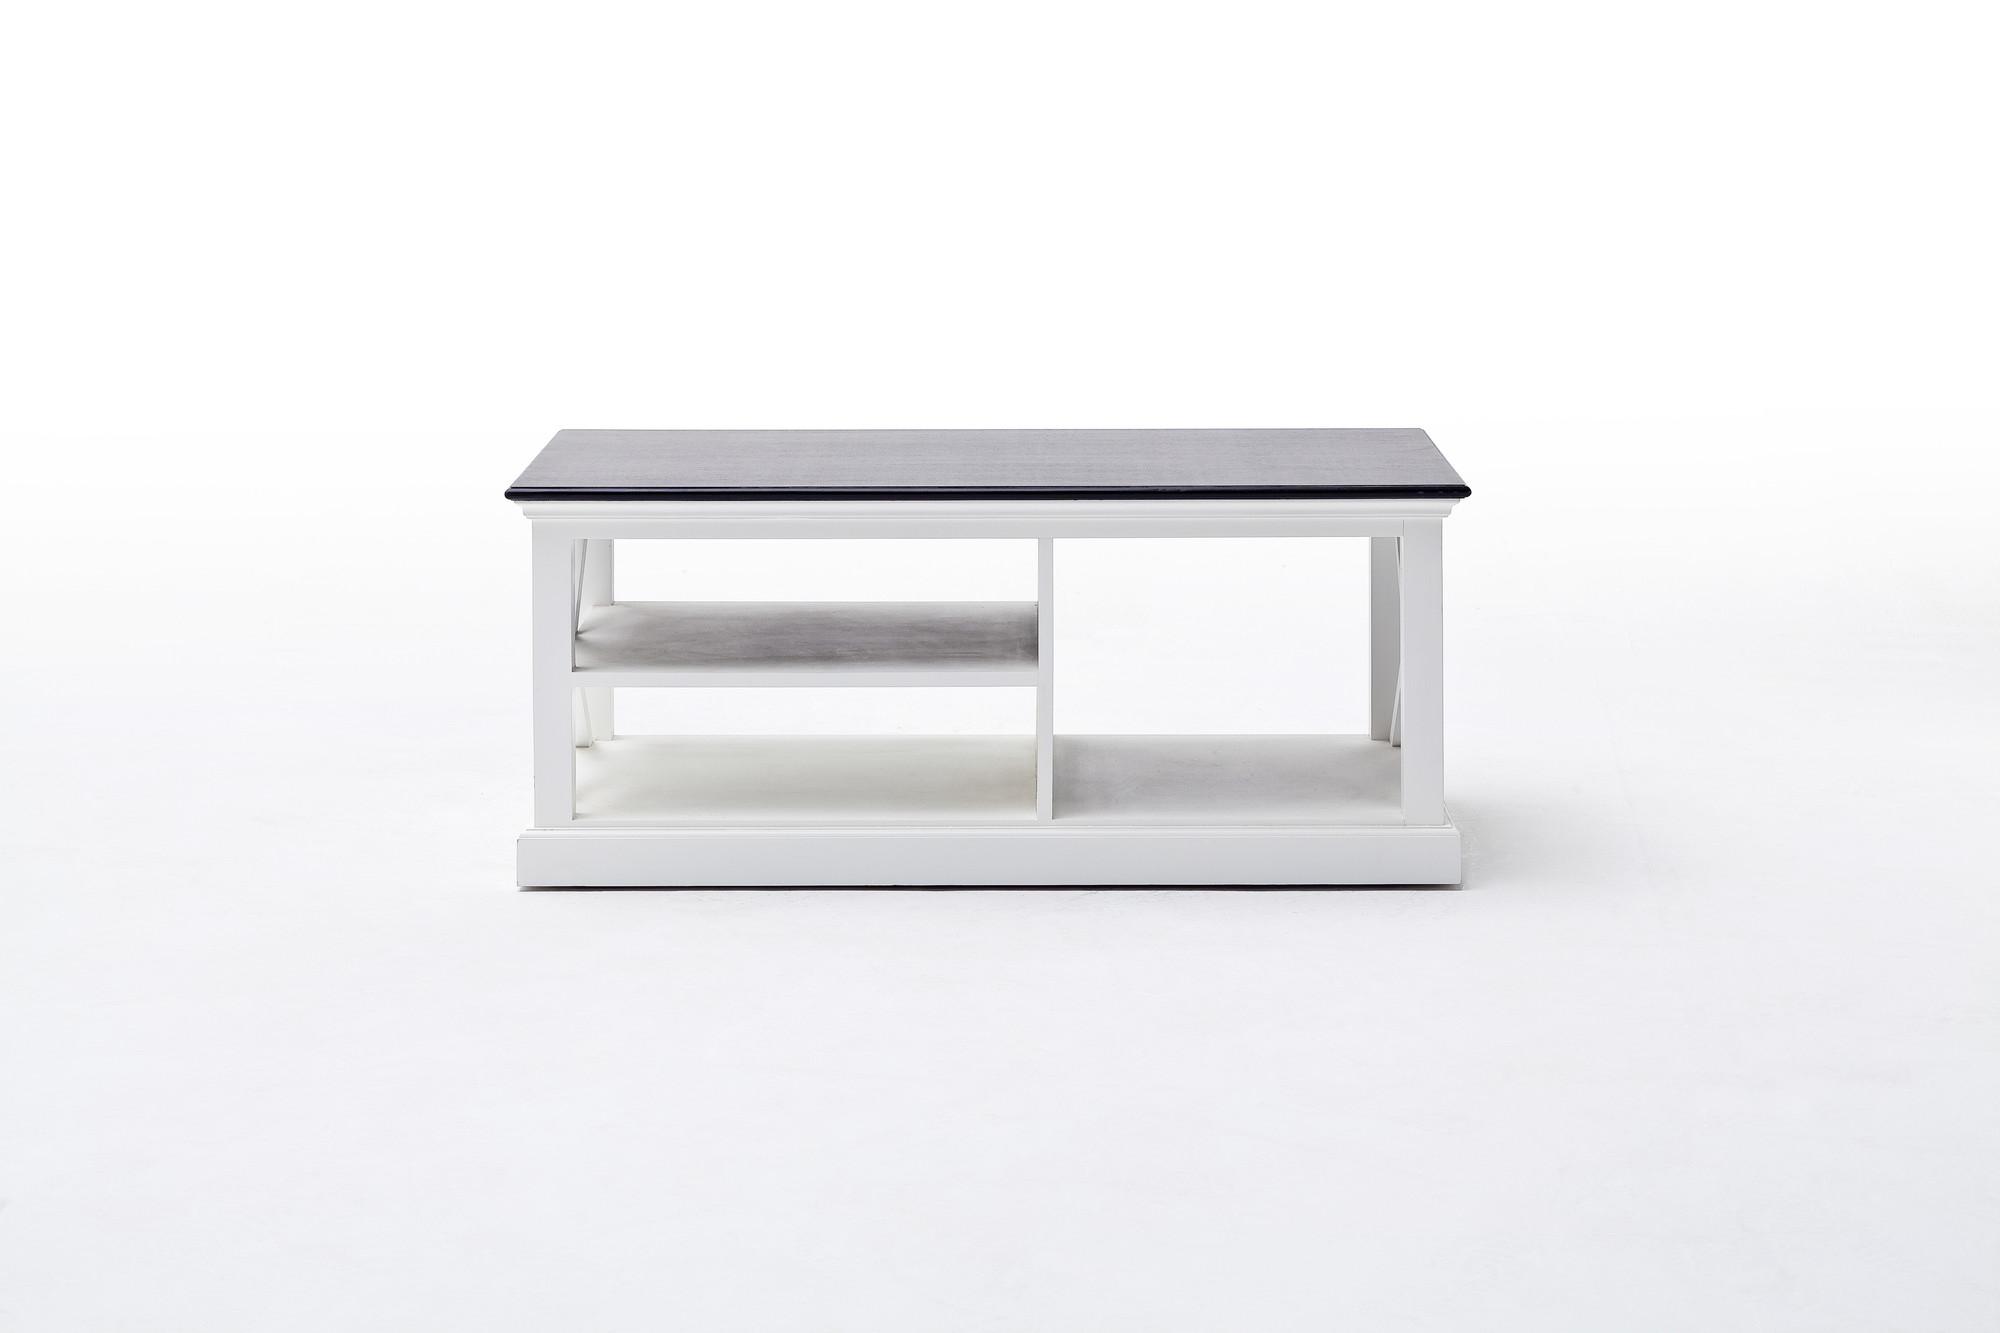 Coastal Coffee Table in White